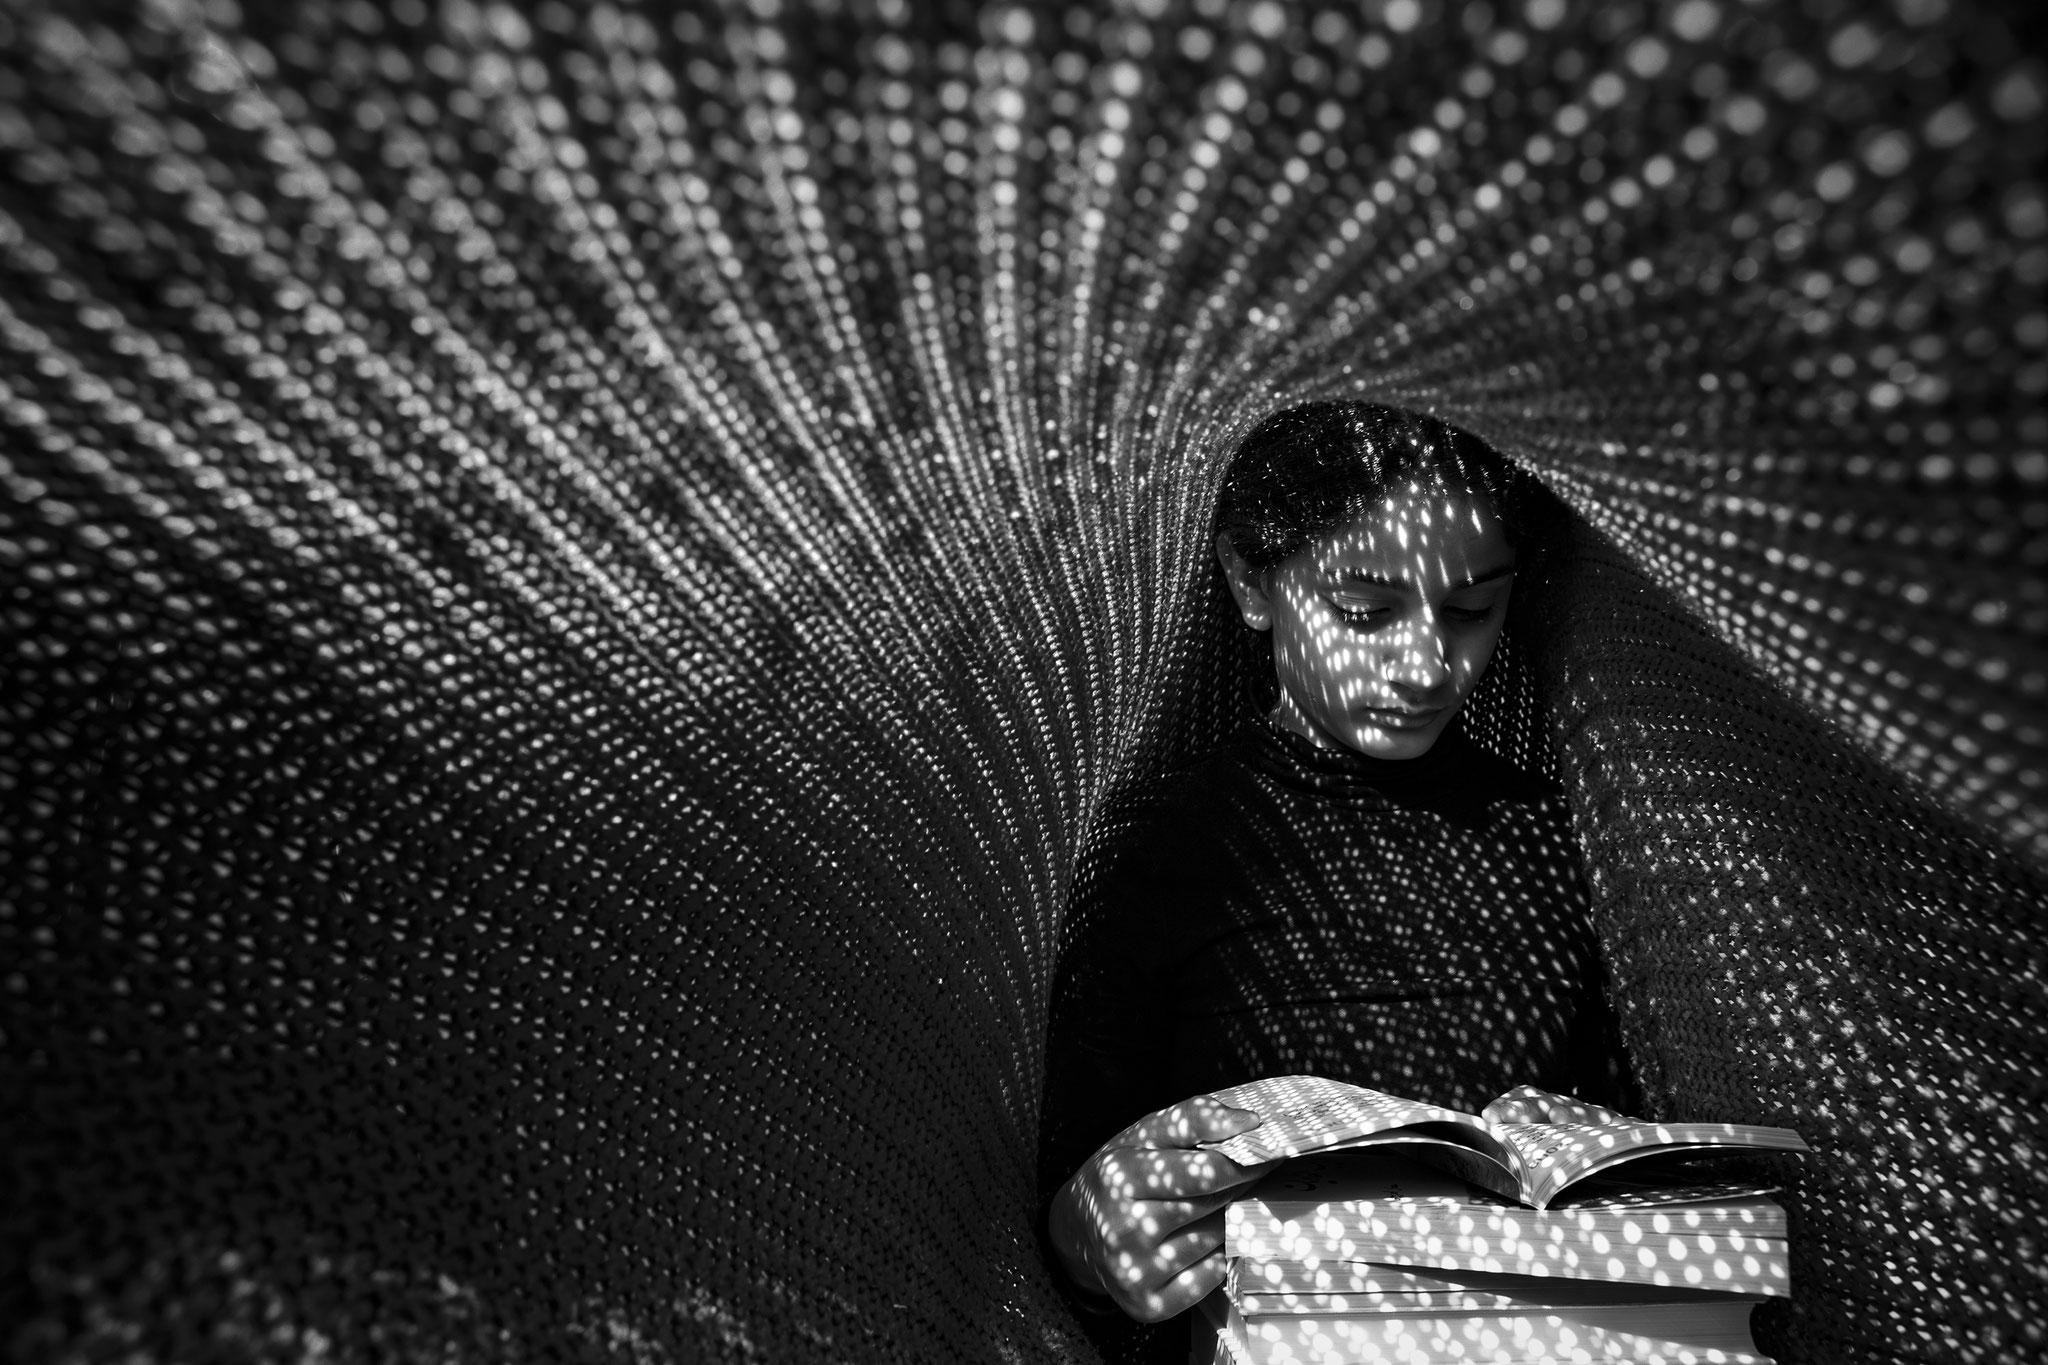 Laila Alibrahim AFIAP (Saudi Arabia) - Light of life